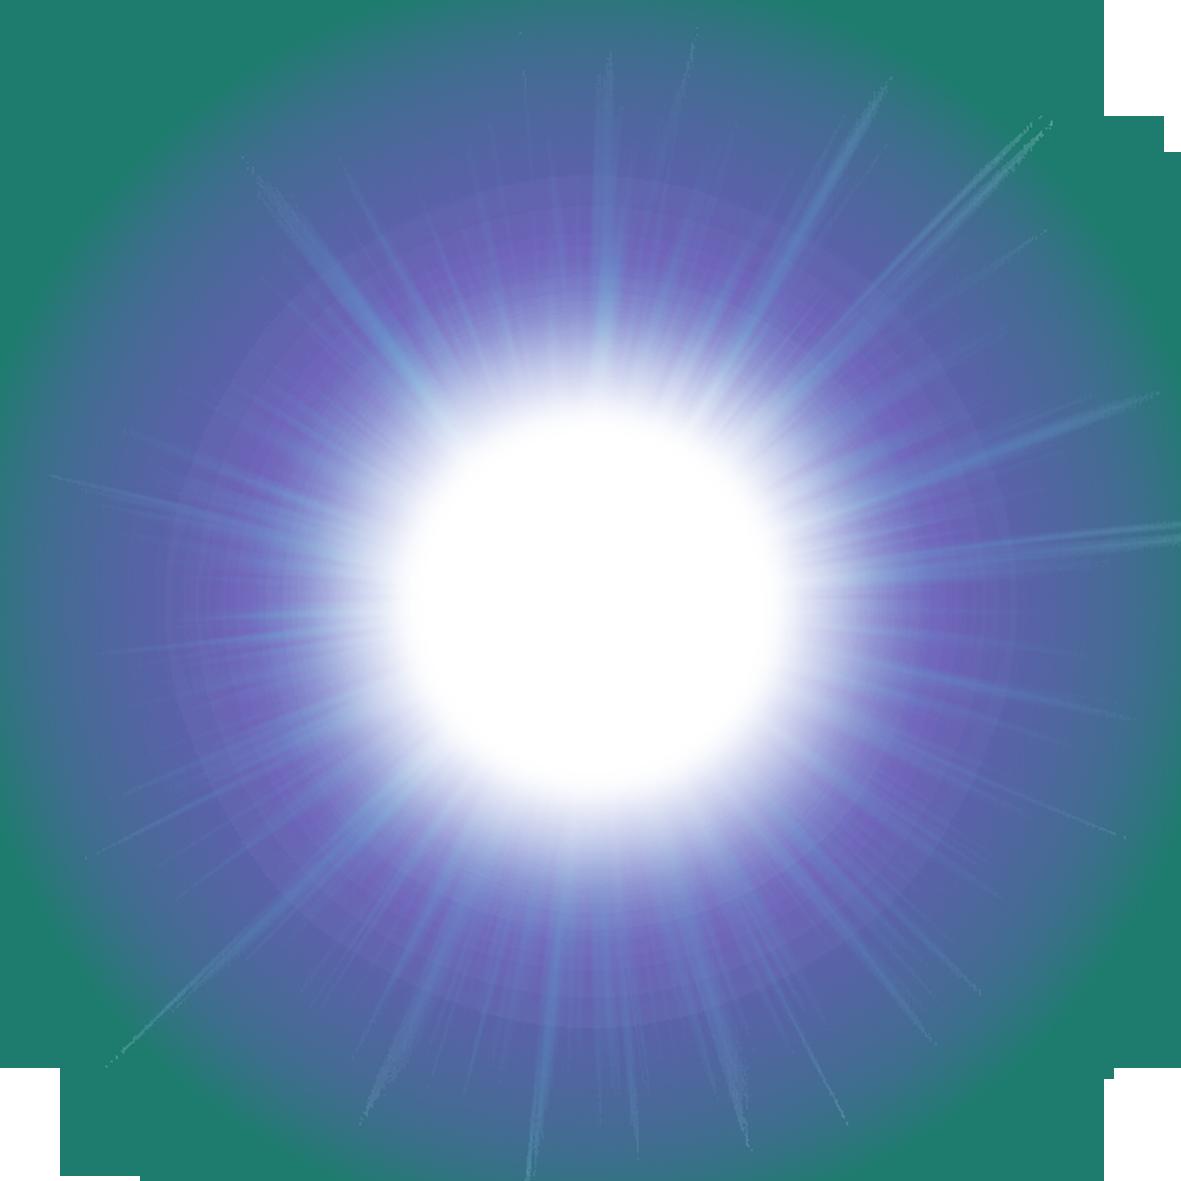 Sun PNG Image - PurePNG | Free transparent CC0 PNG Image ...